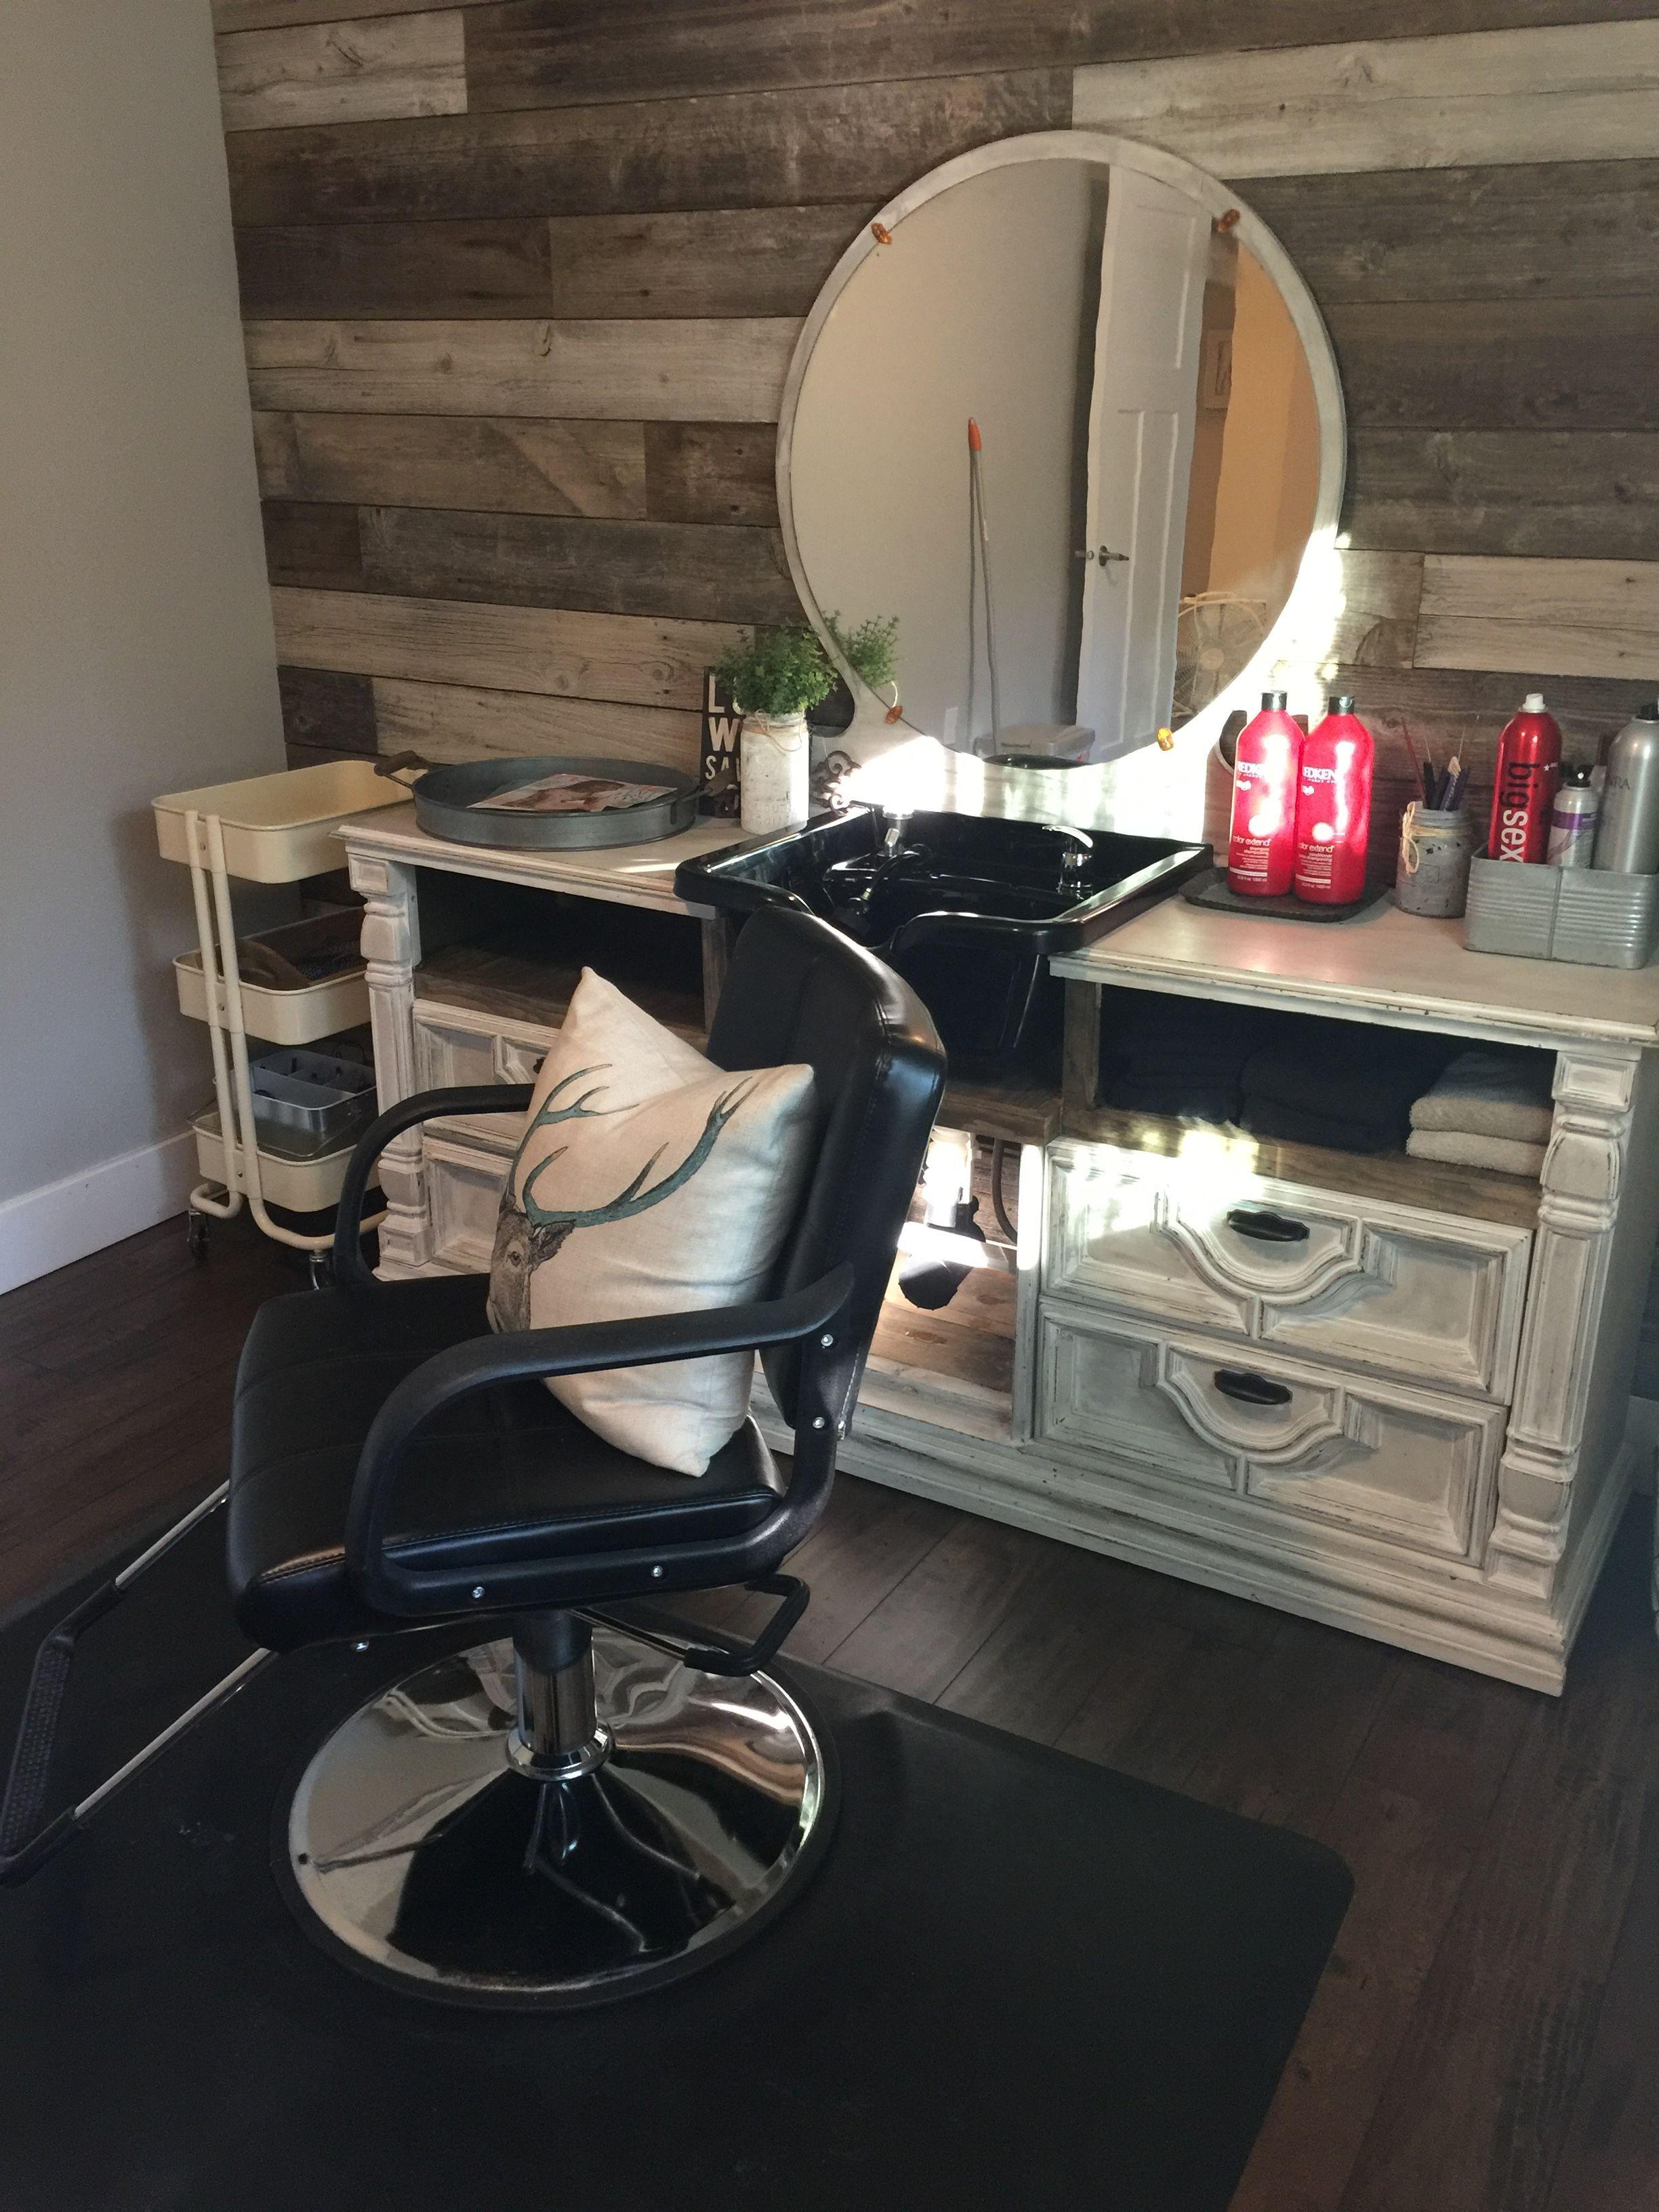 Diy Shampoo Bowl In Dresser Home Salon Home Hair Salons Salon